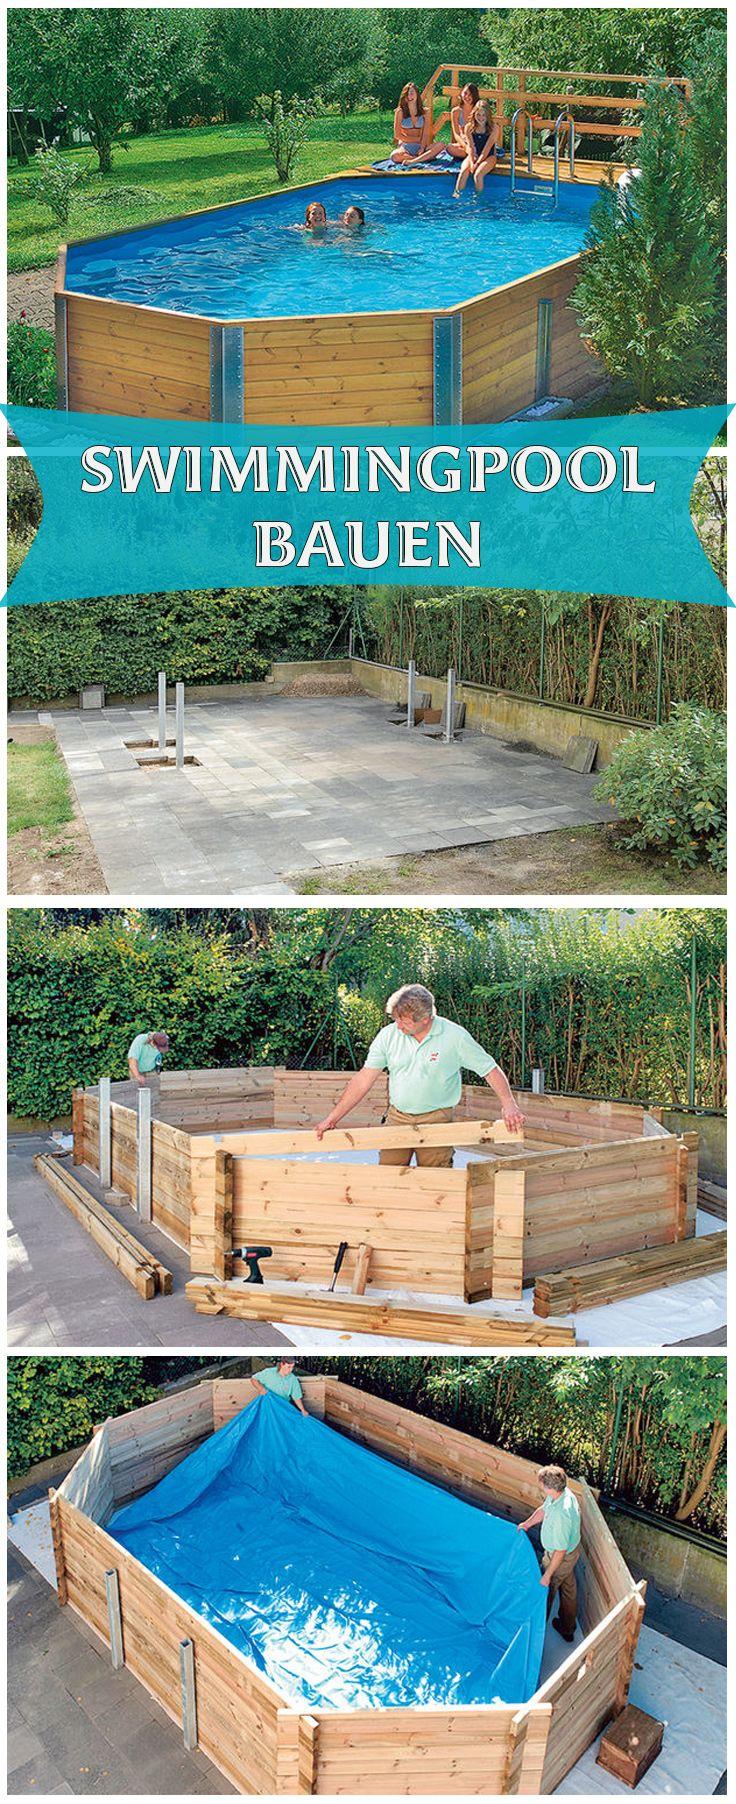 bausatz-pool | bahçe | pinterest | garten, pool bausatz und swimmingpool